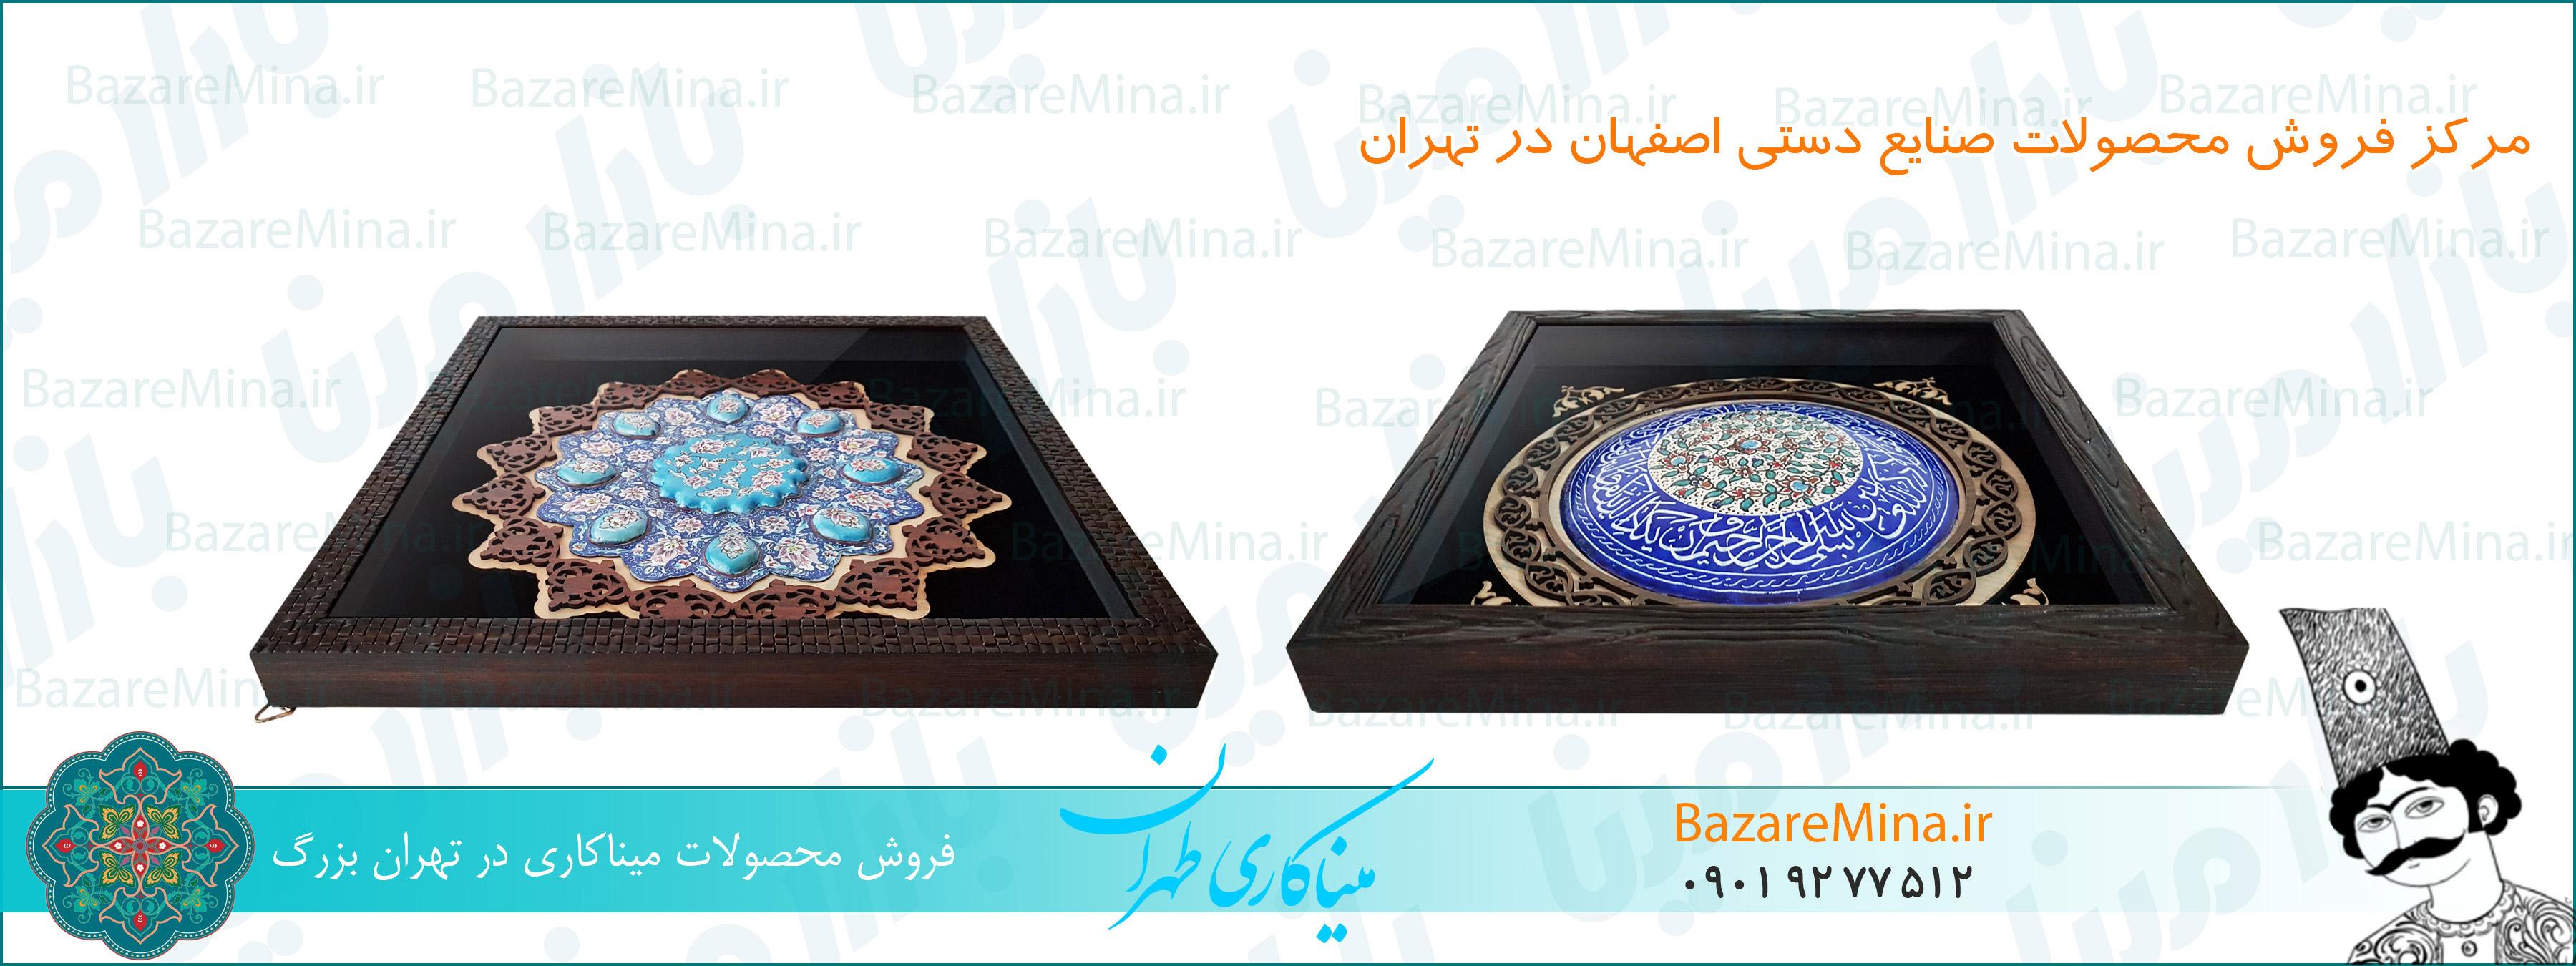 فروش میناکاری تهران